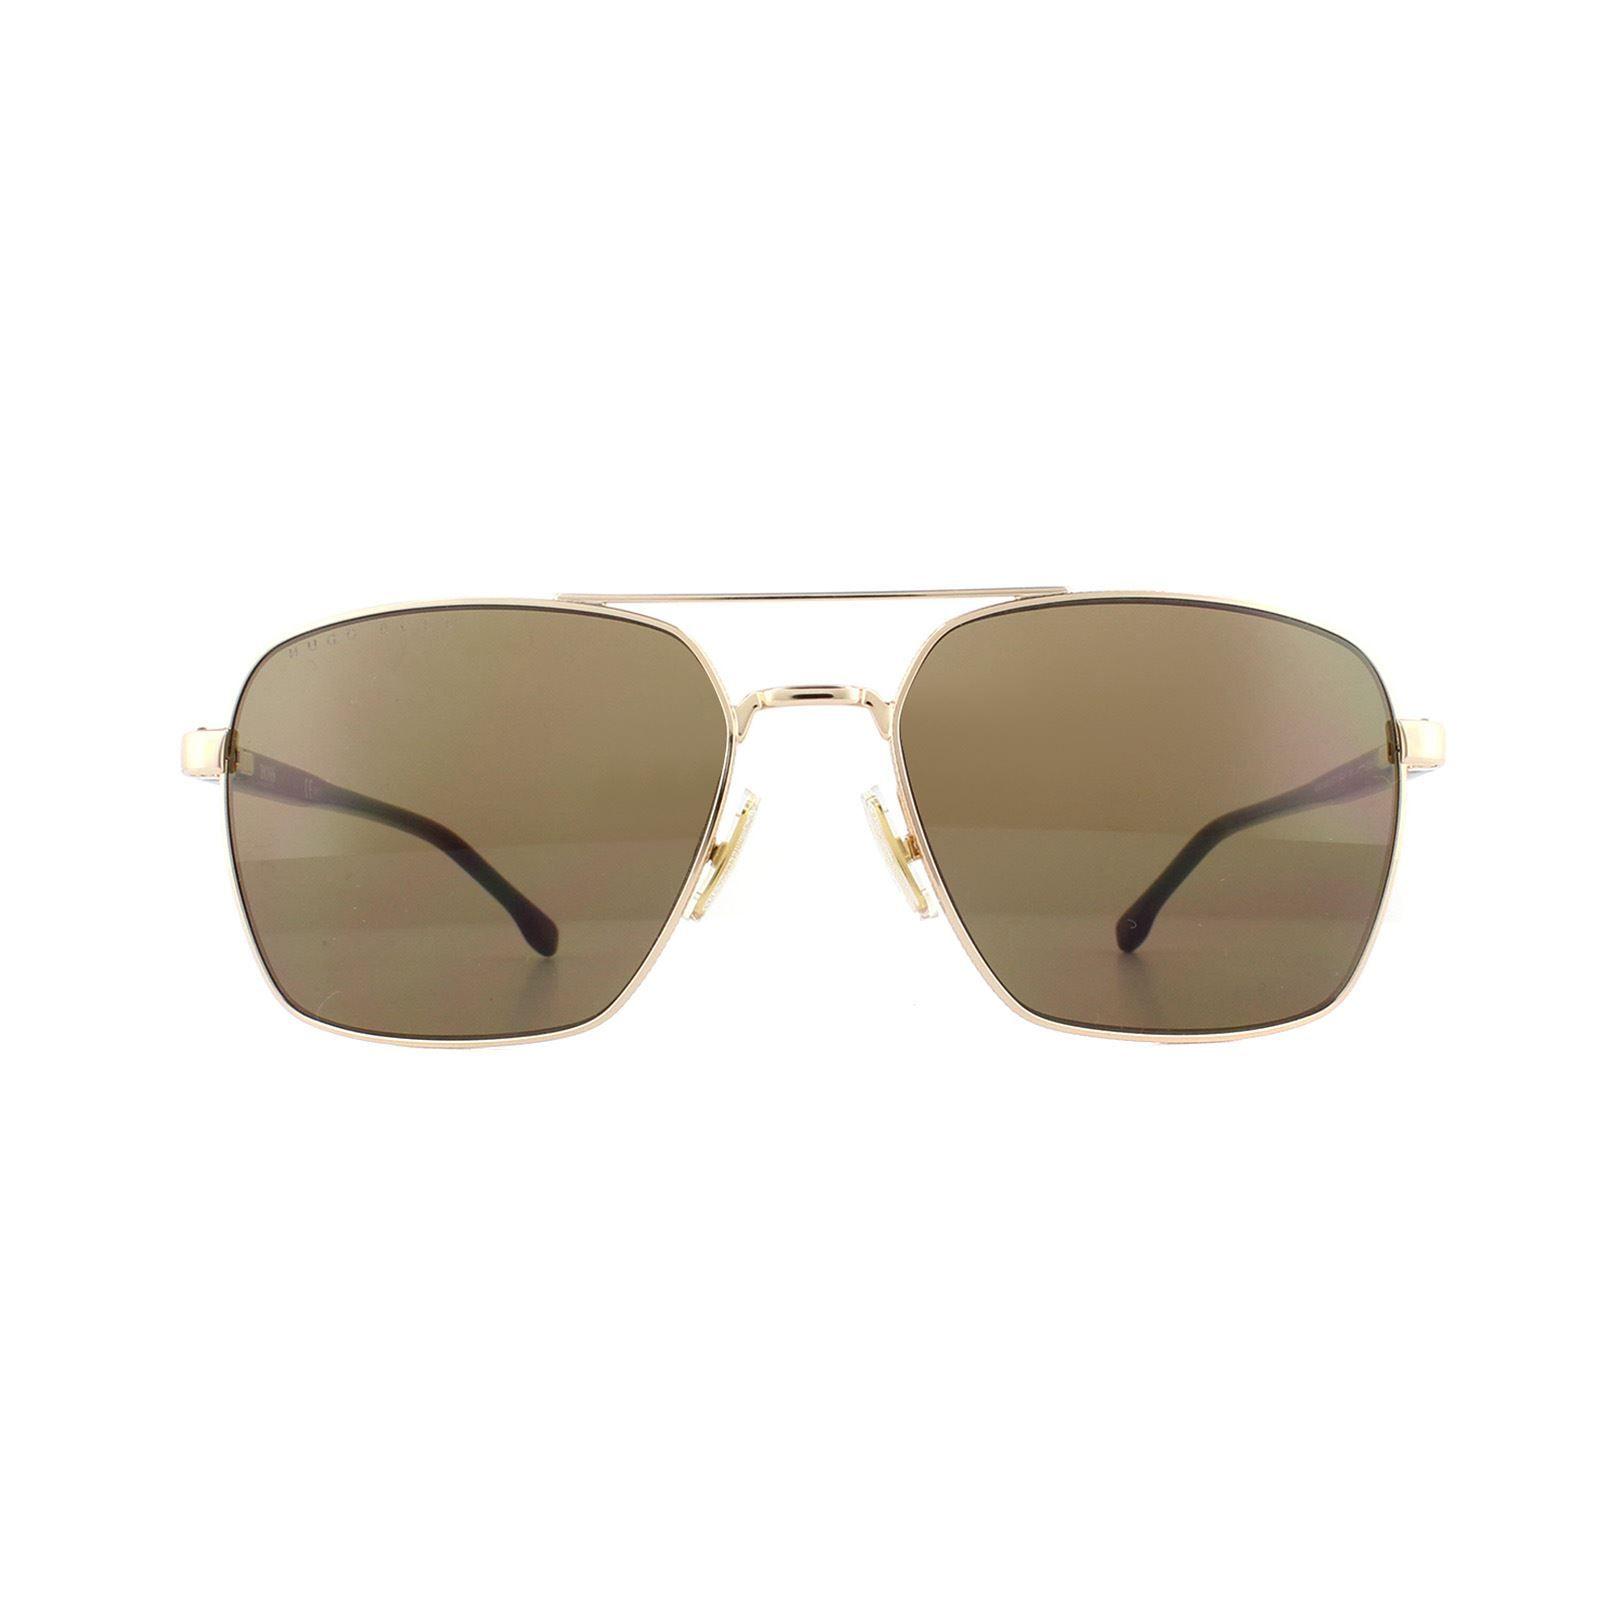 Hugo Boss Sunglasses 1045/S 000 70 Rose Gold Brown Gradient